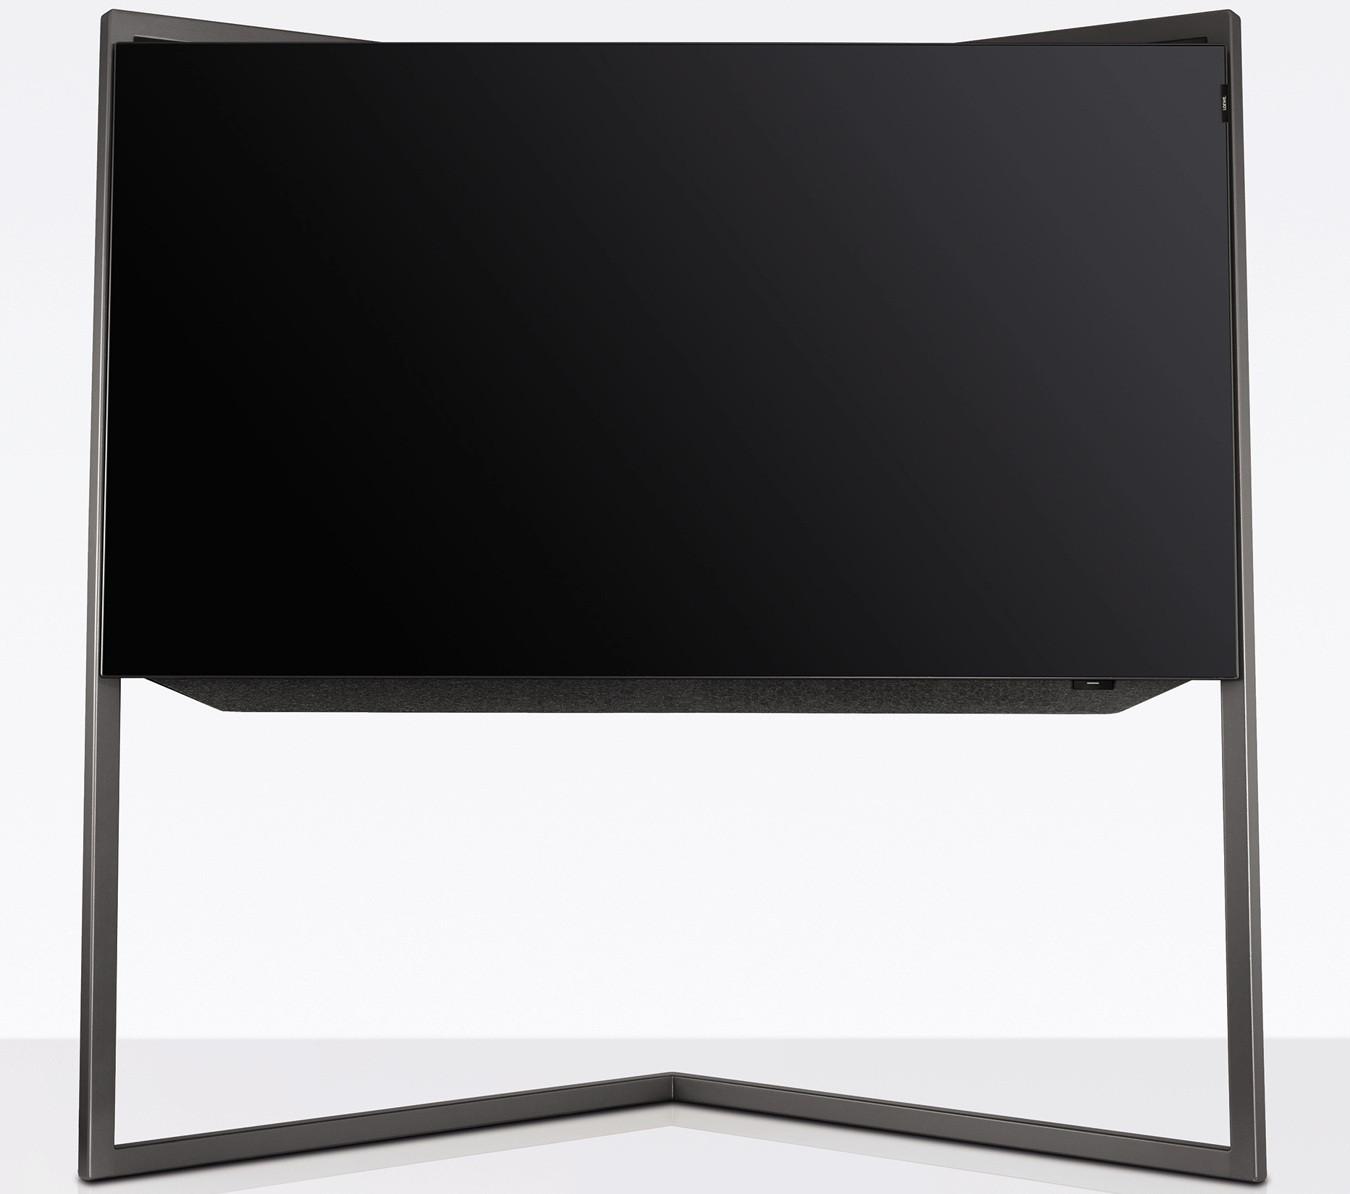 loewe bild mit floorstand graphitgrau loewe fernseher. Black Bedroom Furniture Sets. Home Design Ideas